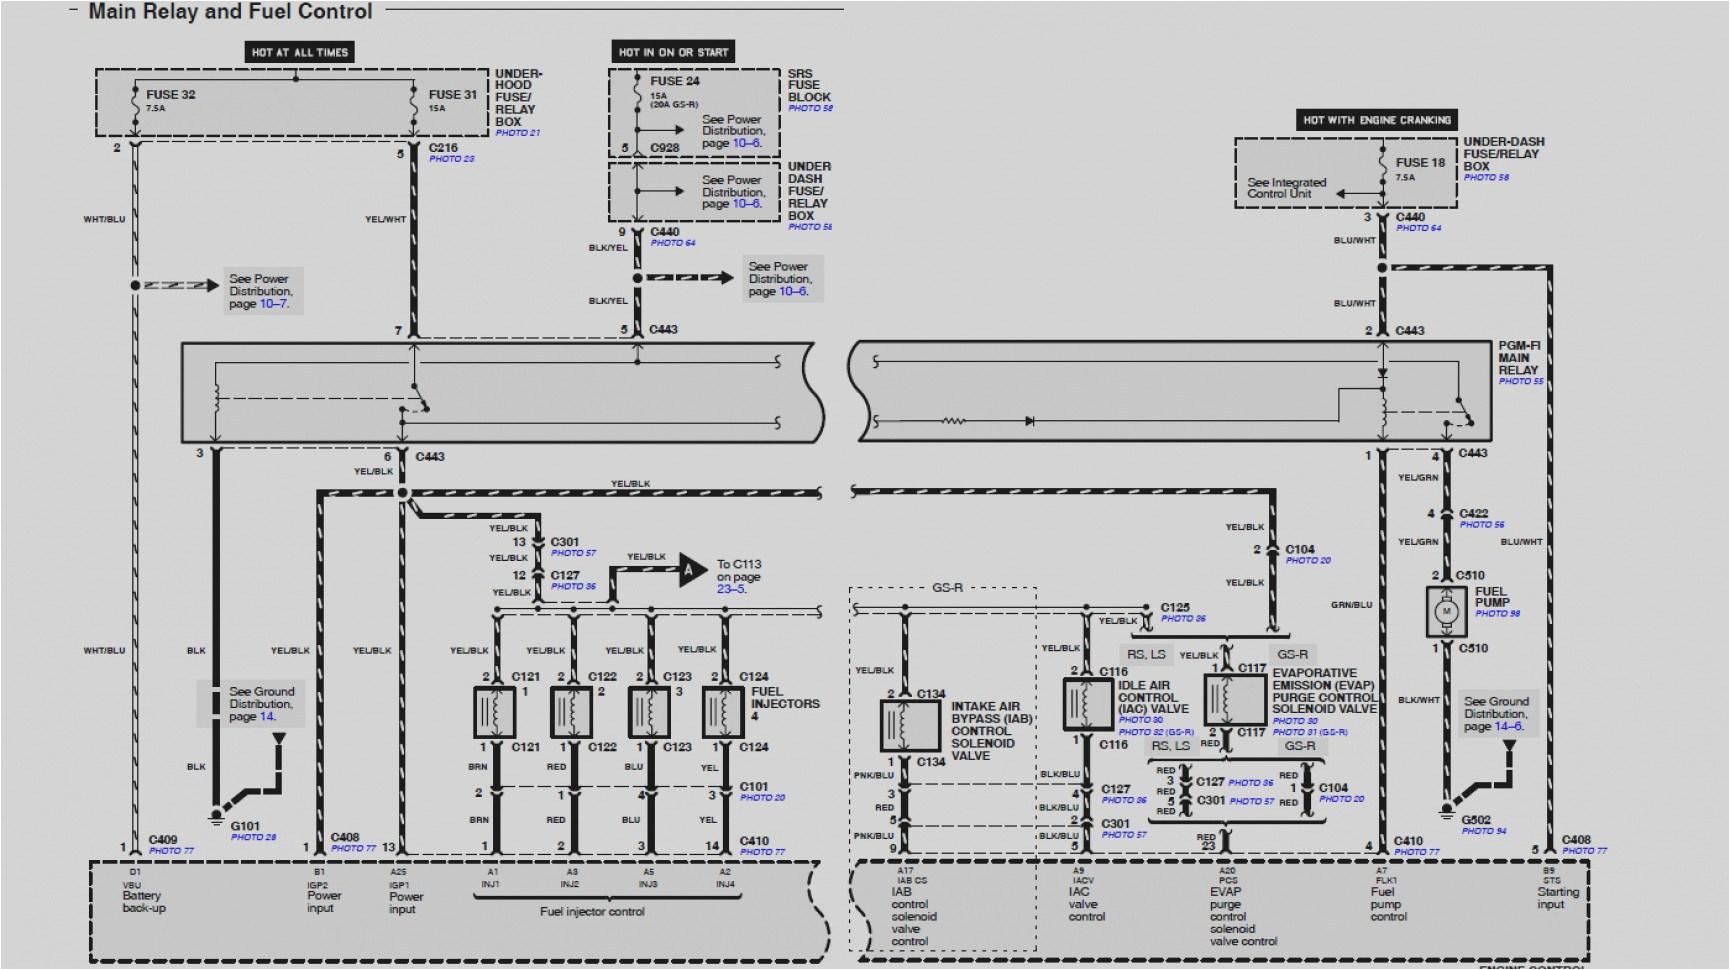 89 acura integra fuel pump relay fuse location free download wiring with acura integra fuel pump diagram moreover 1995 acura legend